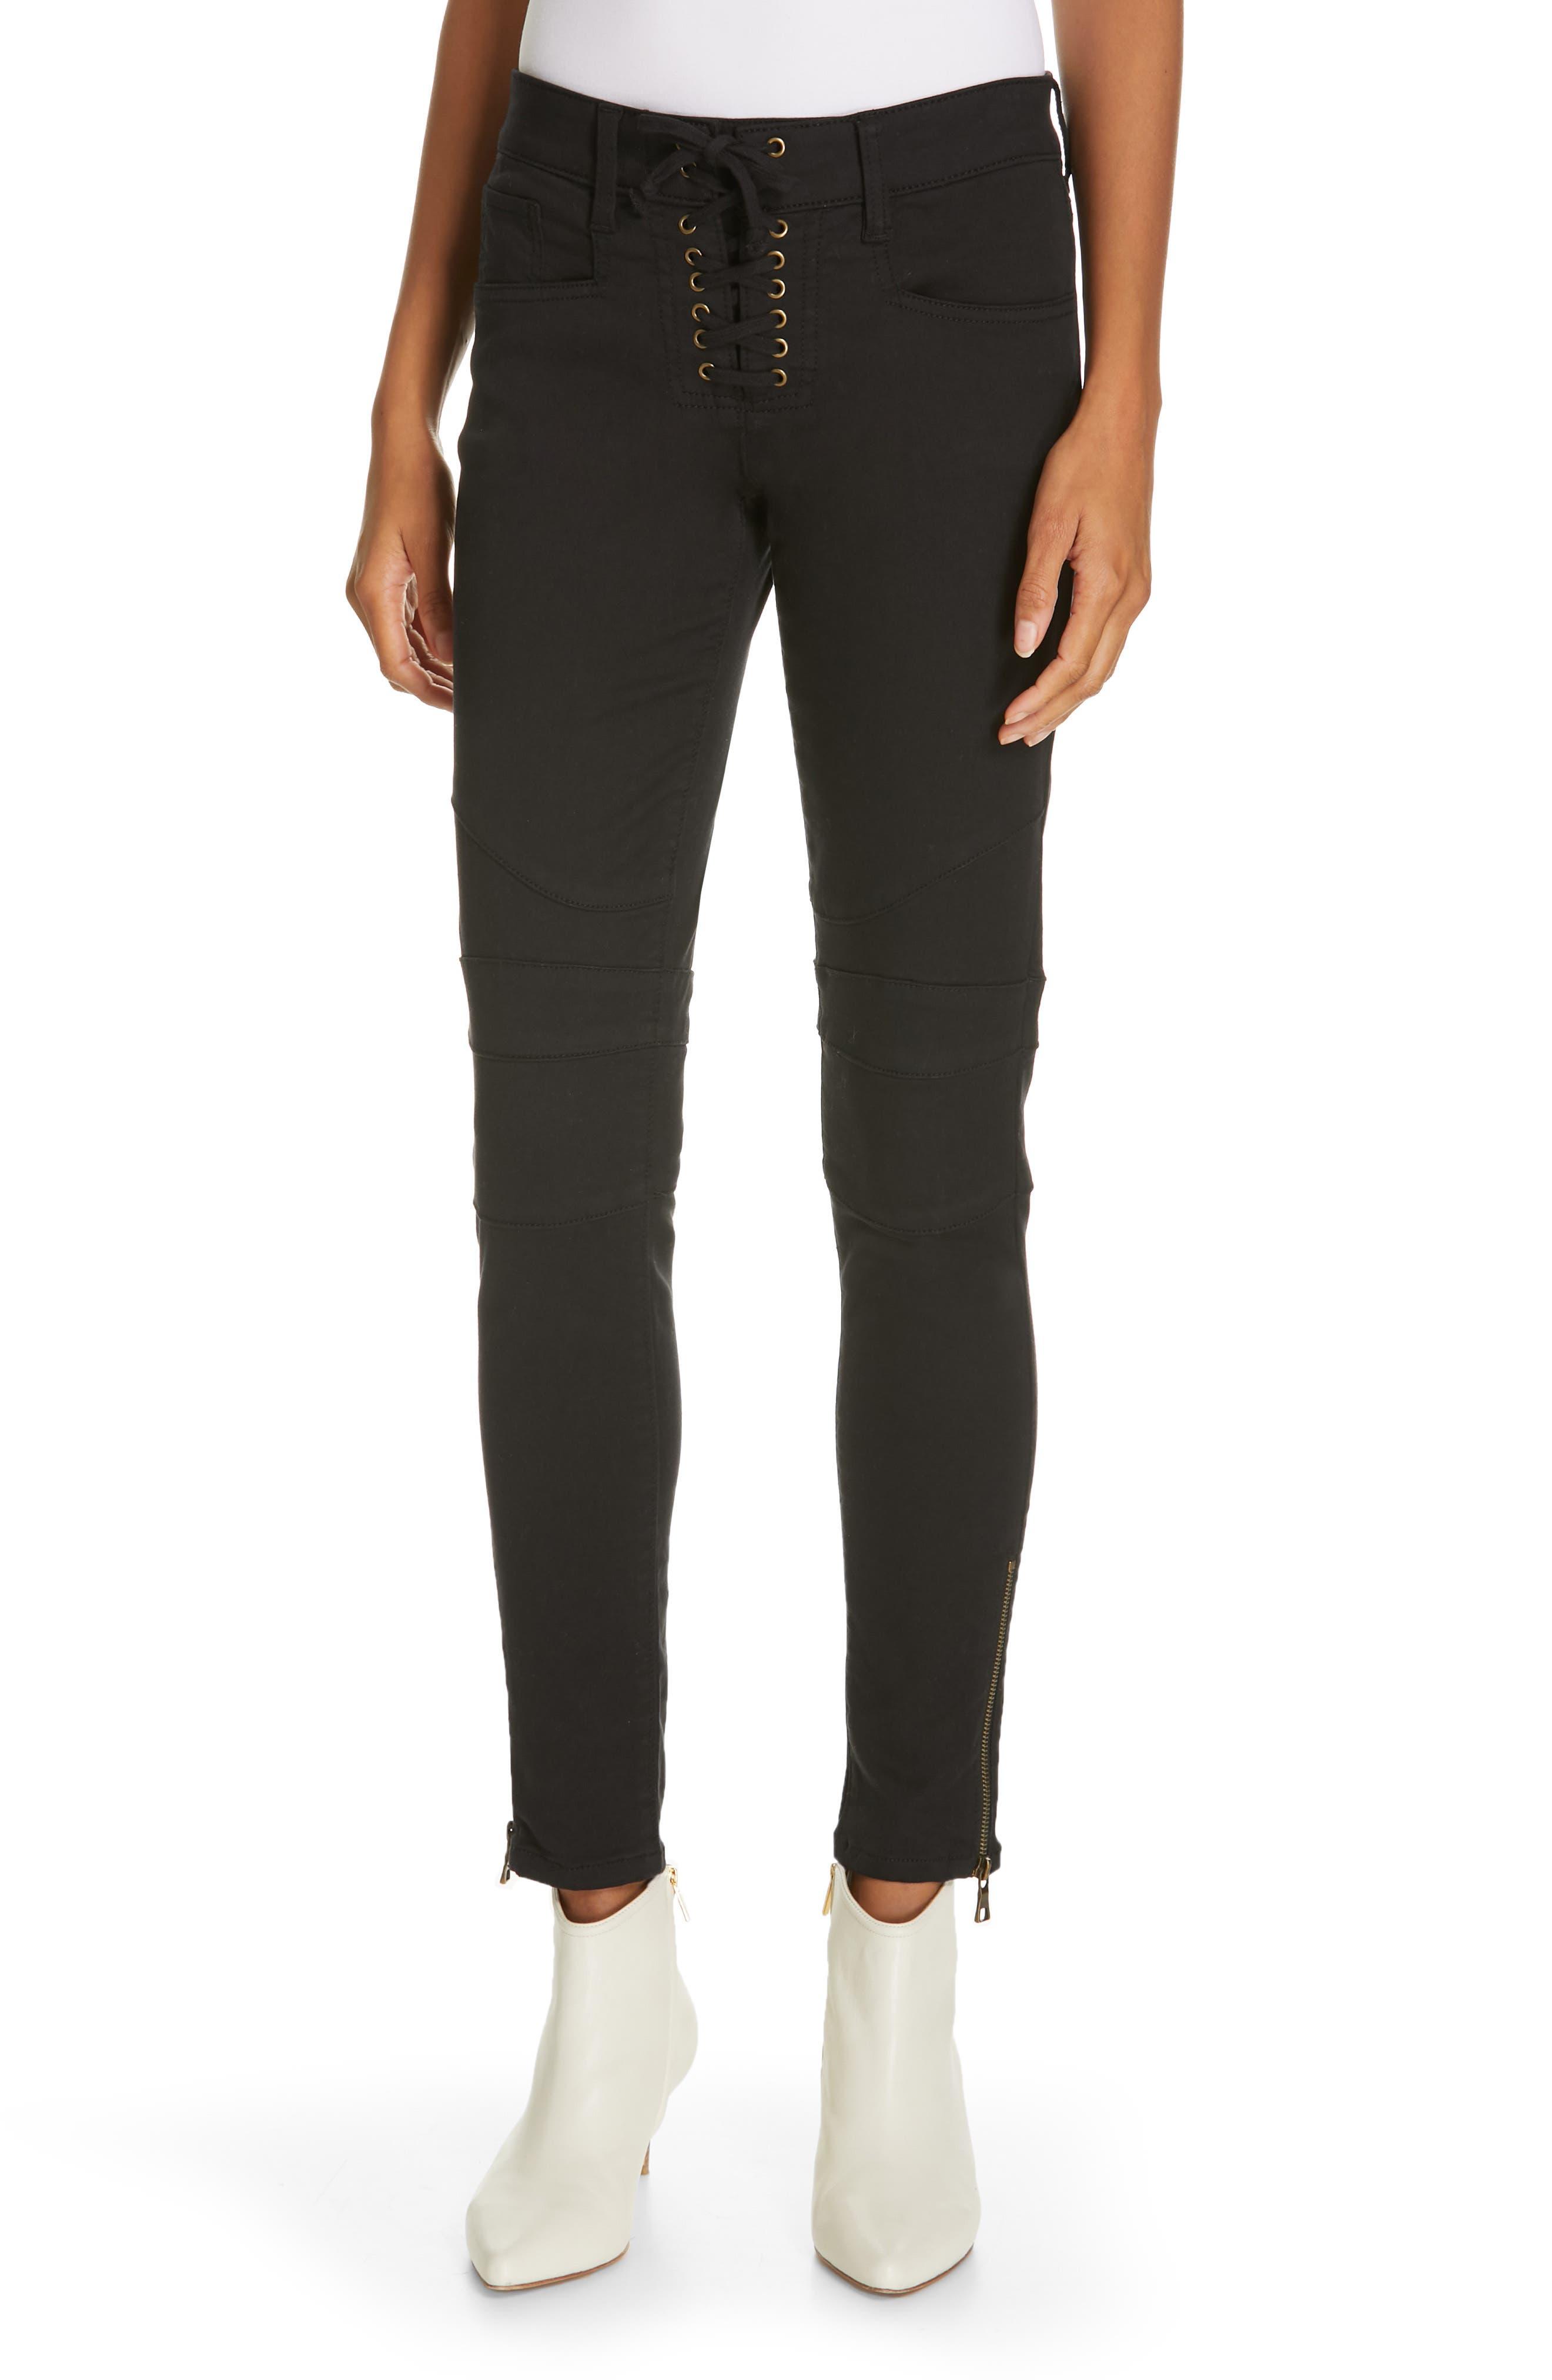 JOIE Adorea Skinny Pants, Main, color, CAVIAR